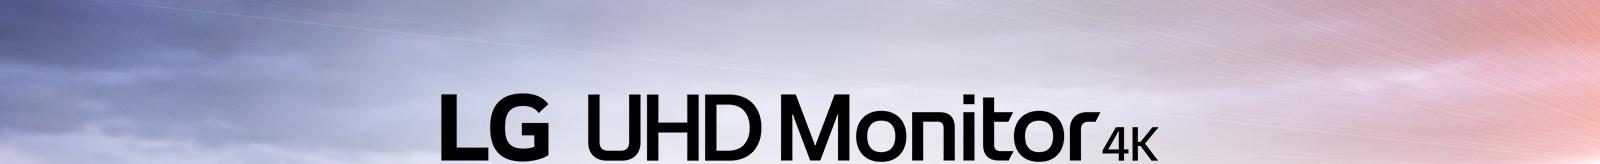 Monitor LG UHD 4K